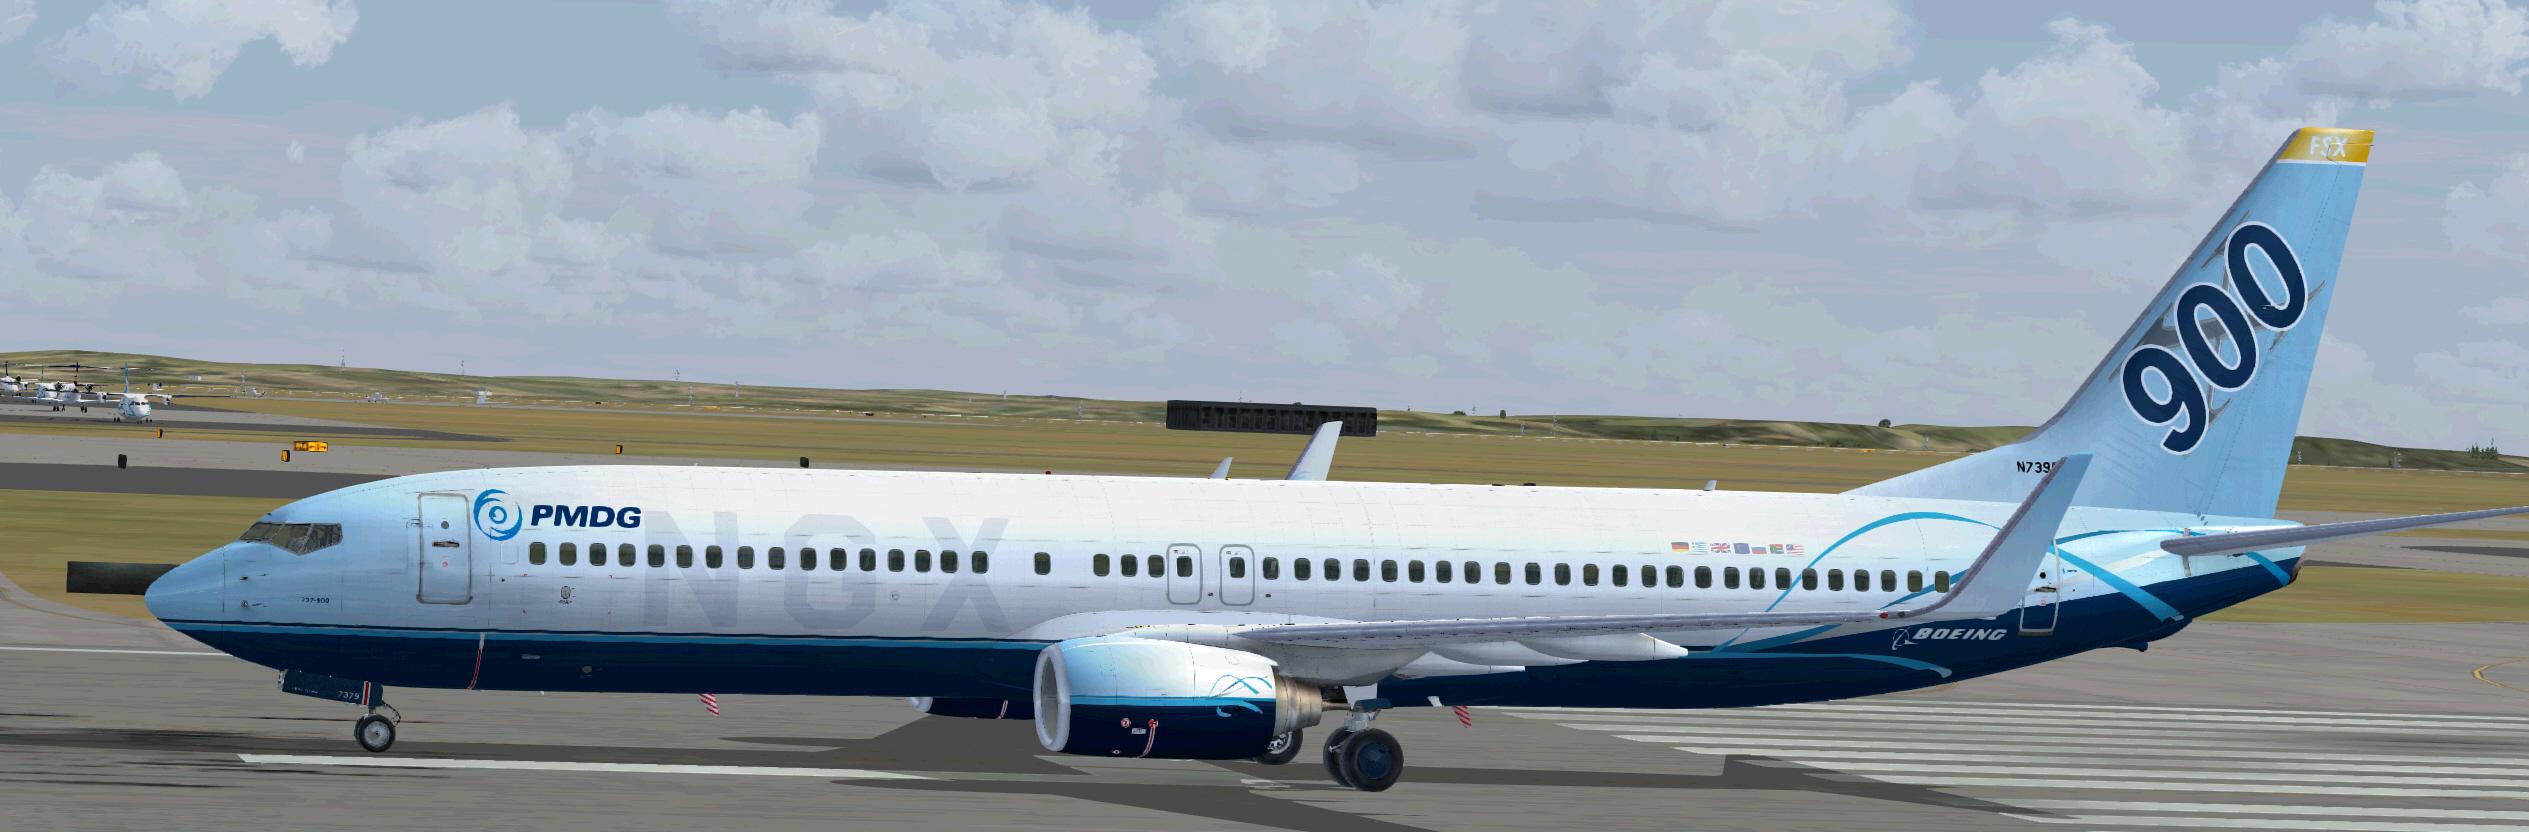 737-900WL